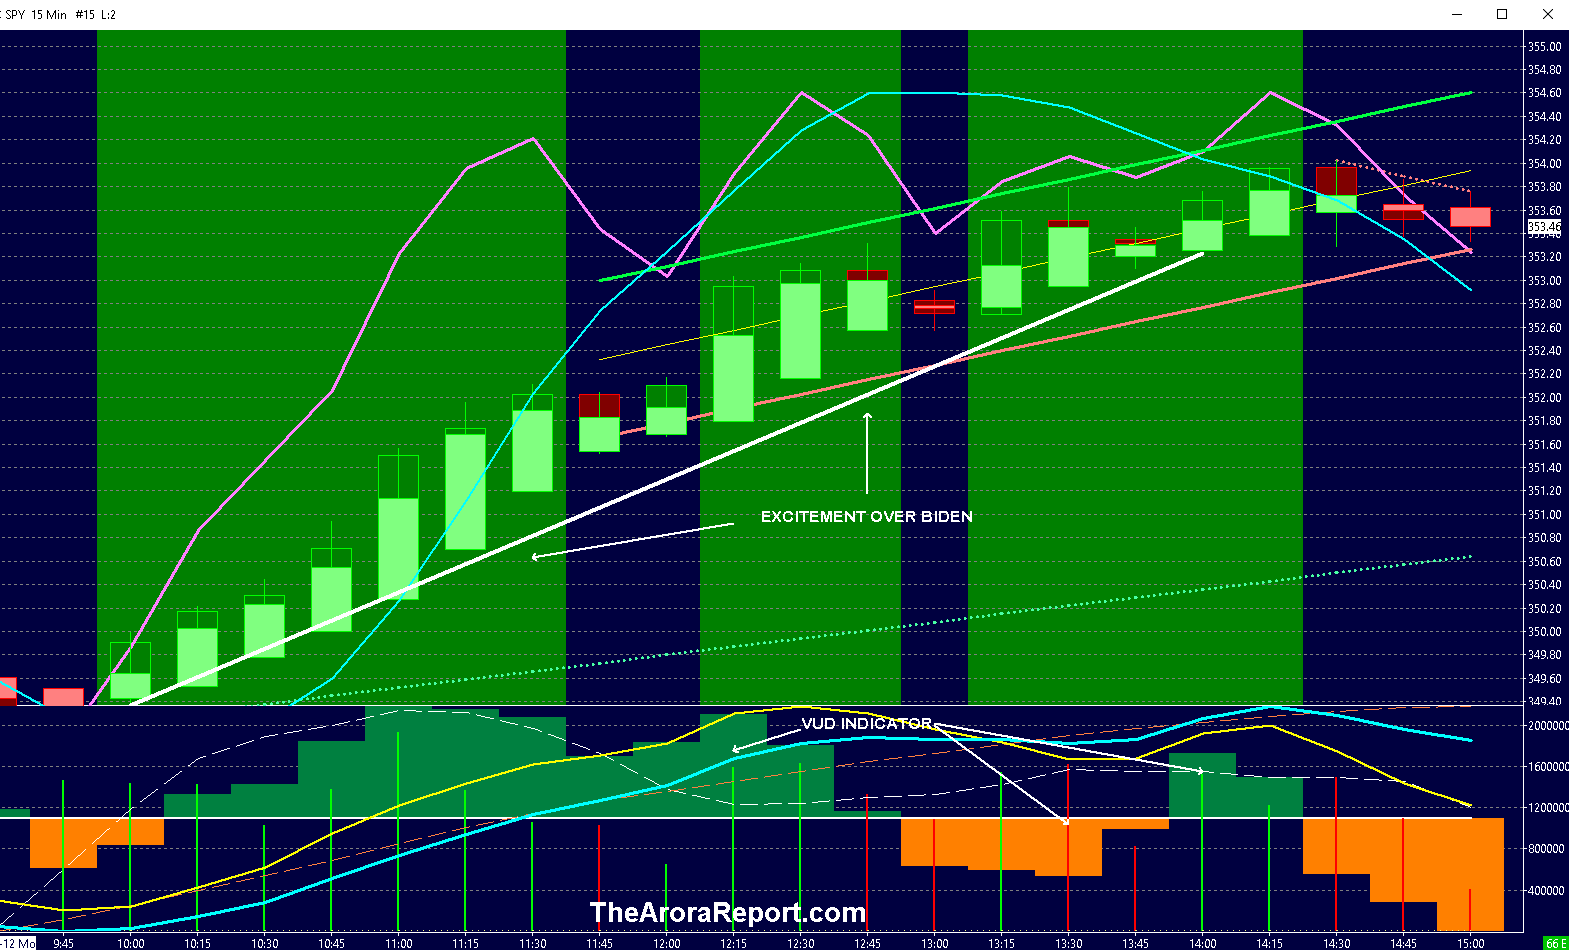 2020-10-12_15h19_19